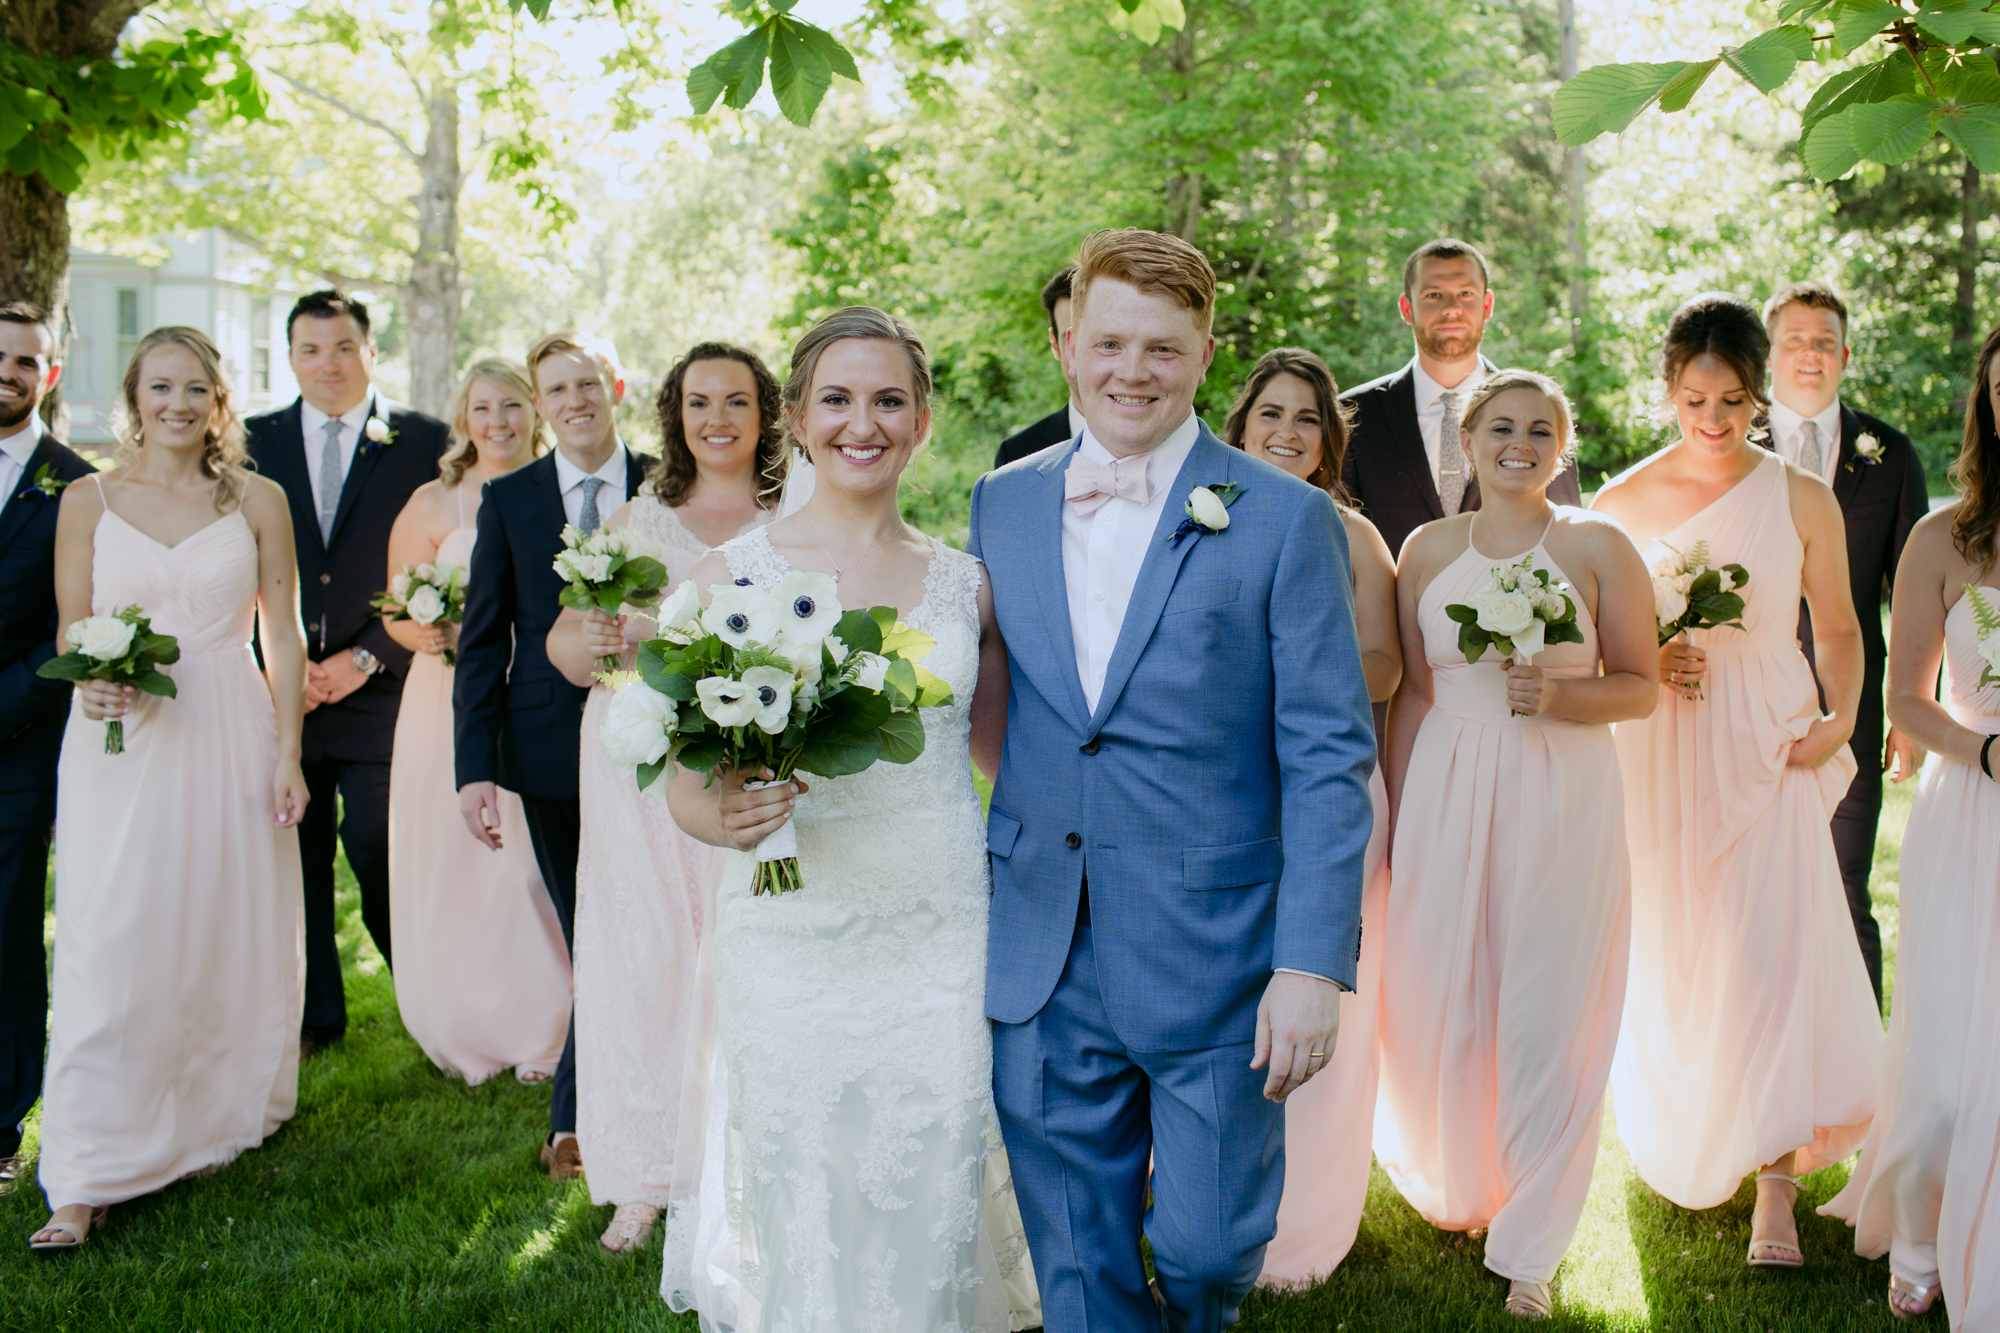 Livewell_Farm_wedding_Harpswell_maine_Meghan_Jim_017.jpg